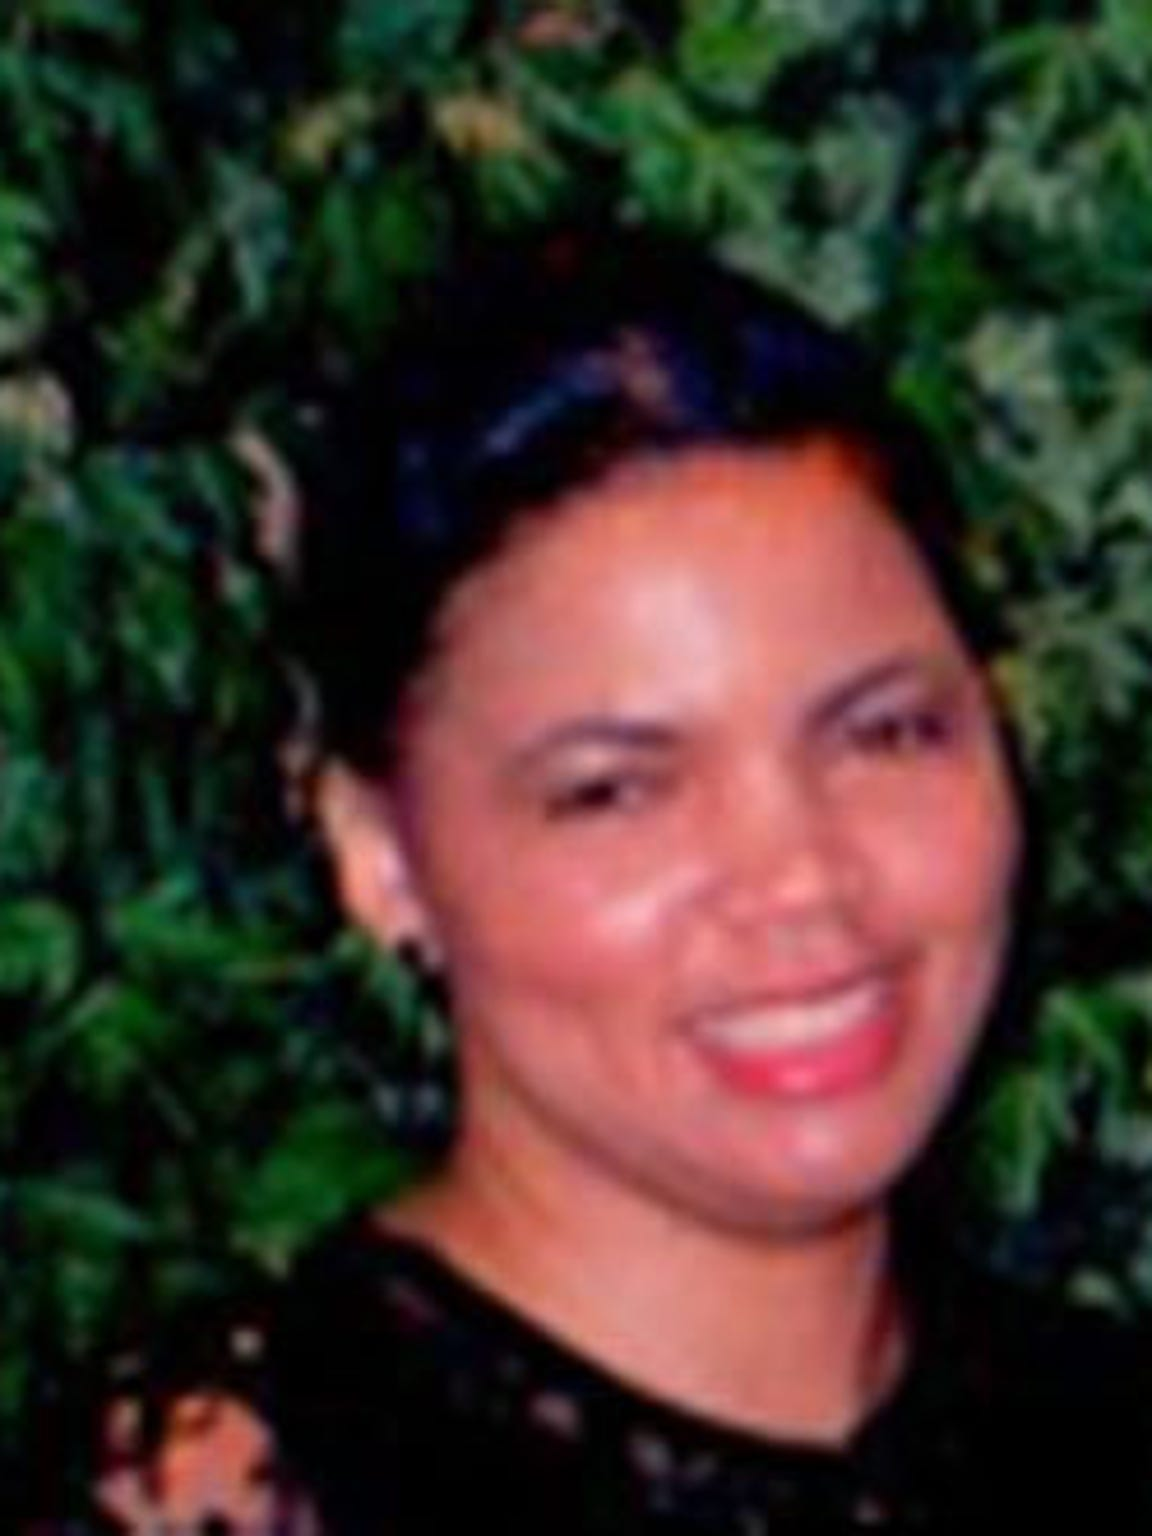 Bernita White was shot and killed in 2001 near the